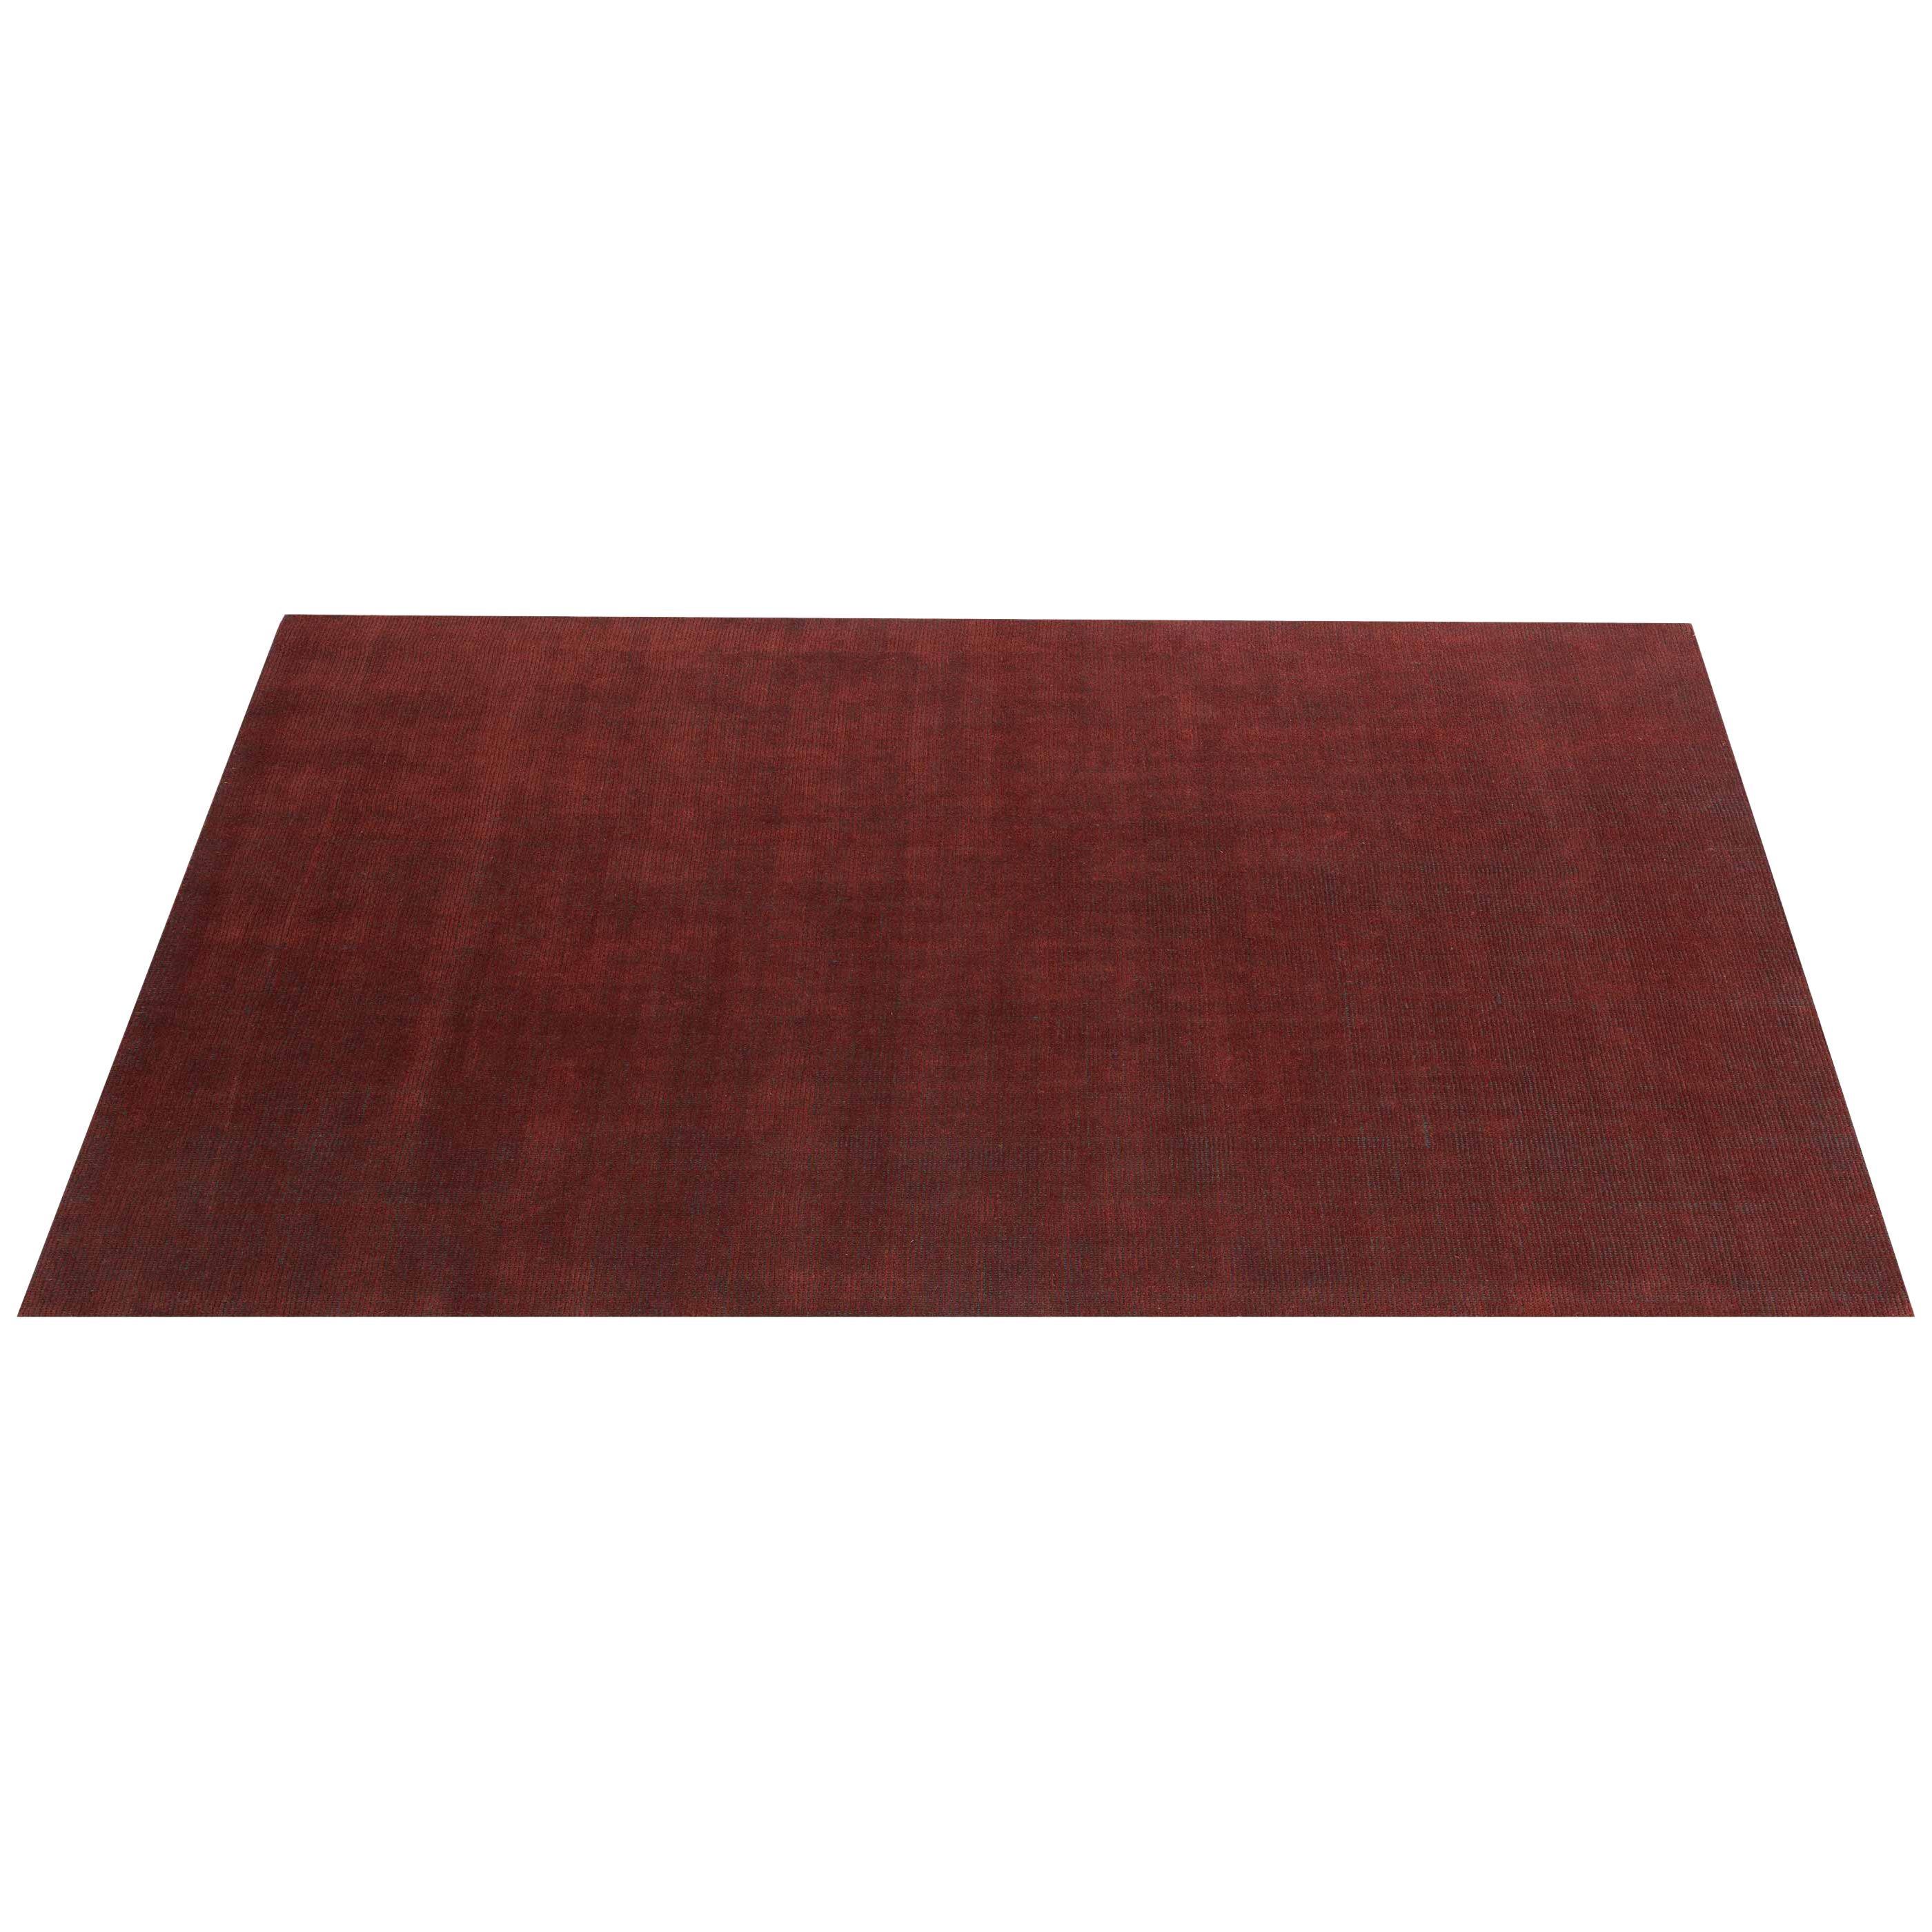 Ben Soleimani Distressed Wool Rug 10'x14'